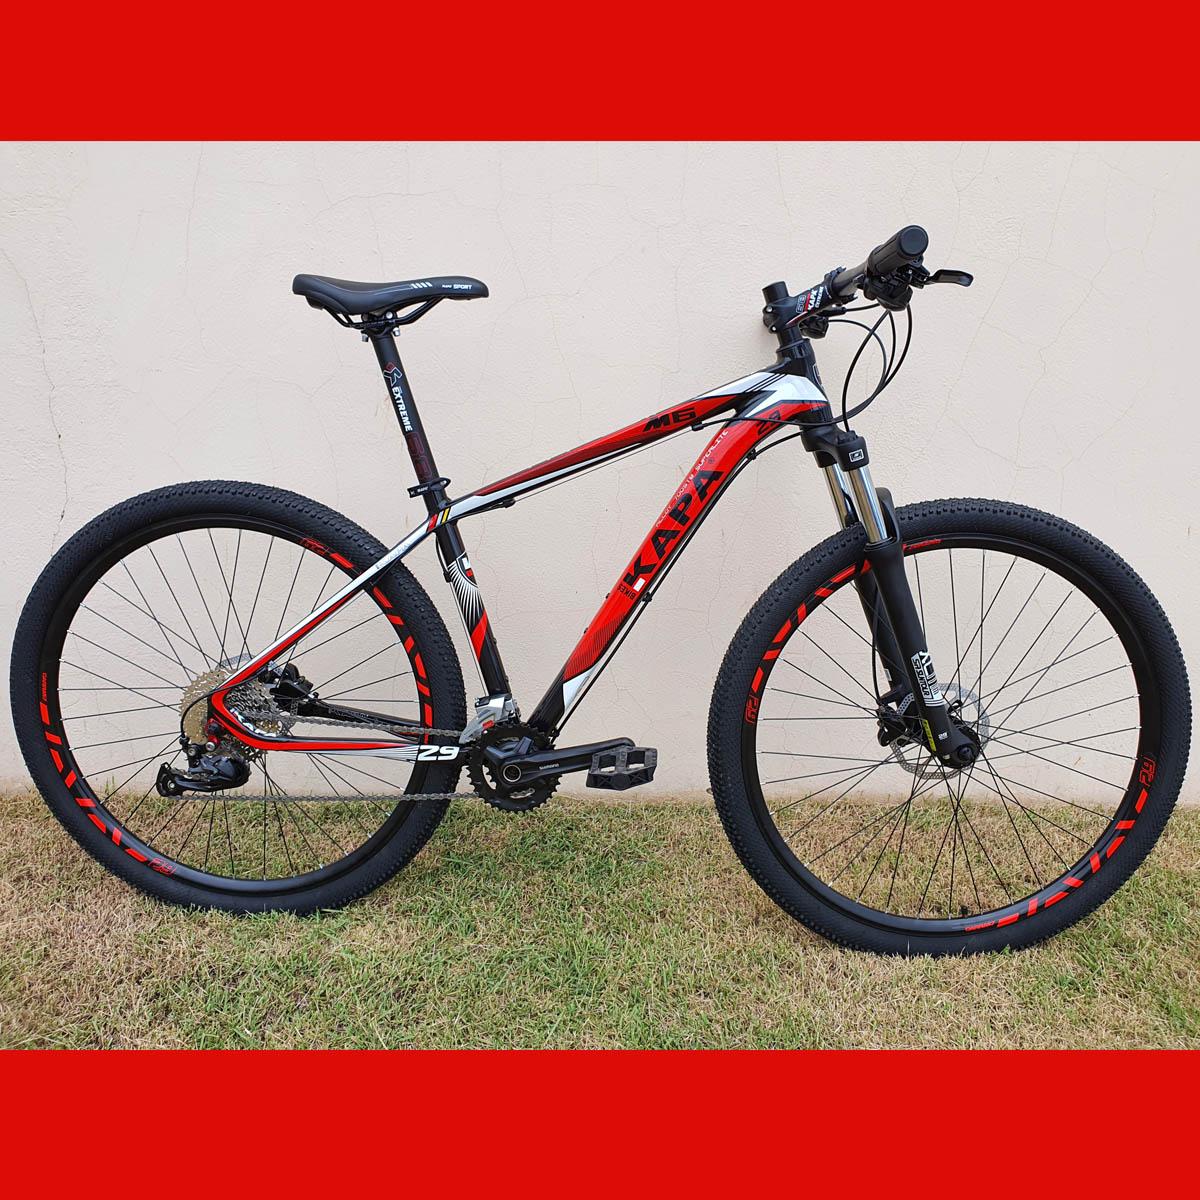 Bicicleta 29 KAPA M6 2x9 Shimano Altus 17.5 Vermelho